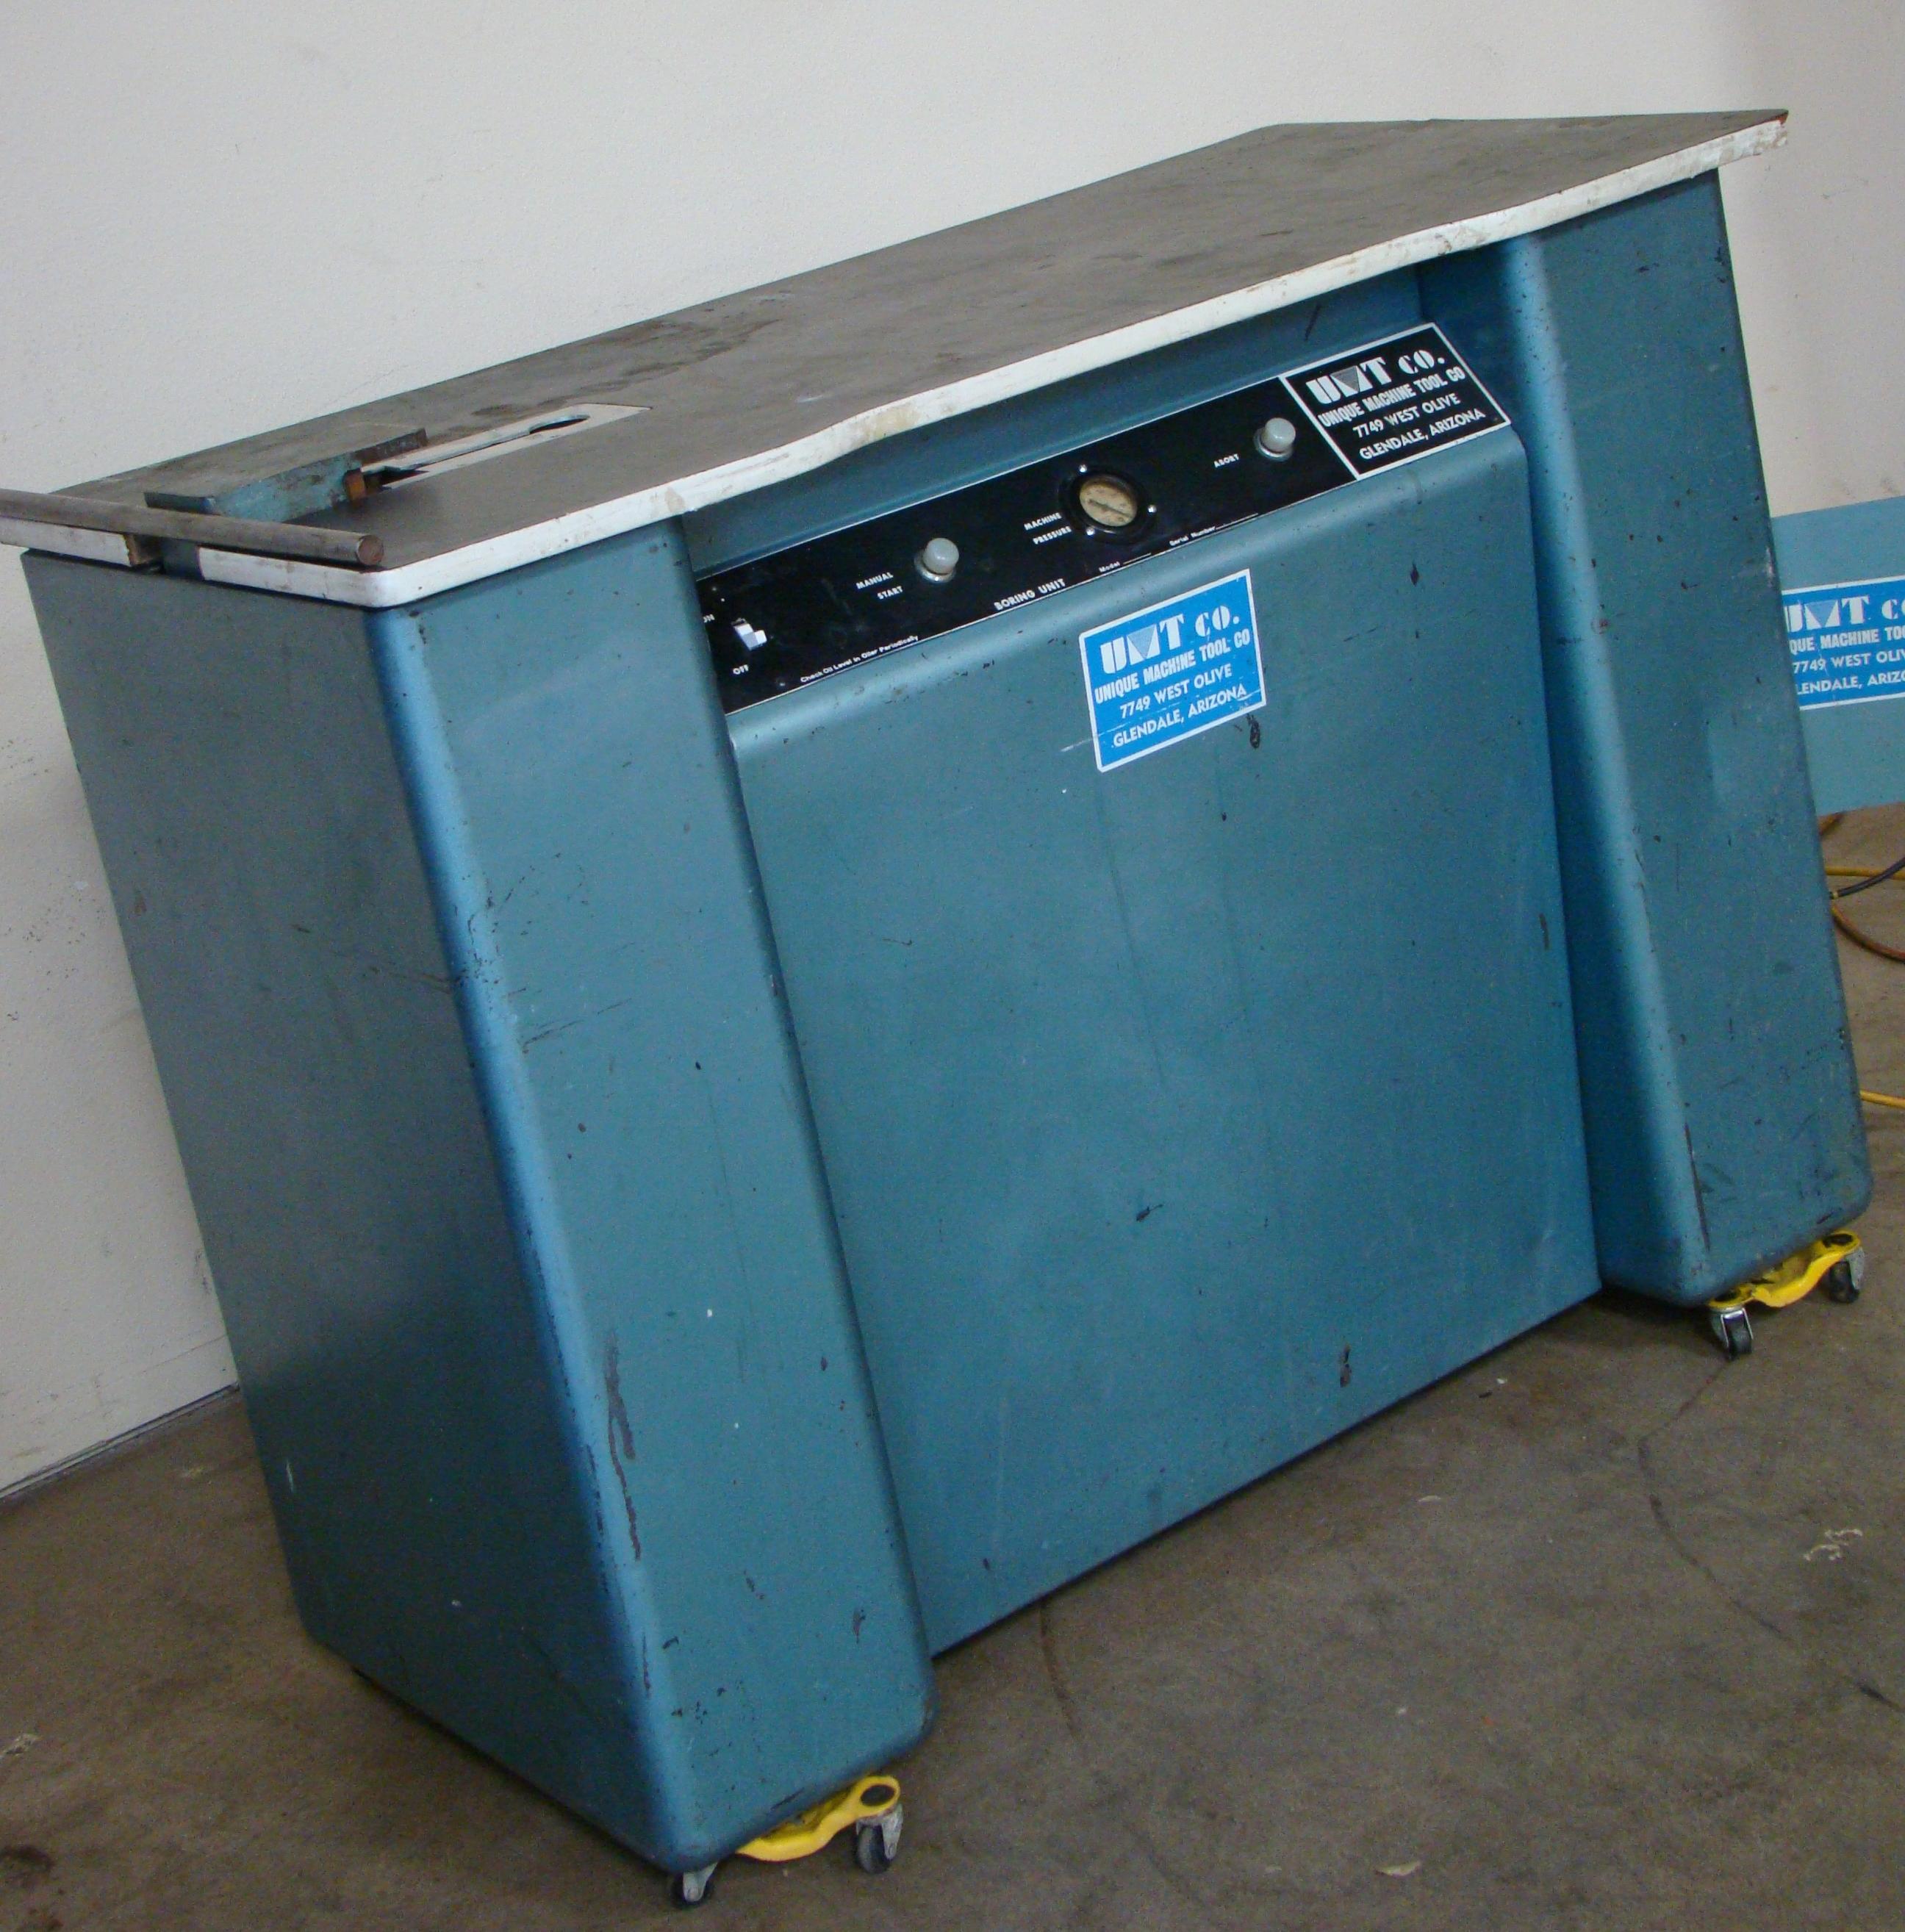 Unique Machine 1 Spindle Pocket Boring Machine, 115 Volts (On Wheels) - Image 4 of 4